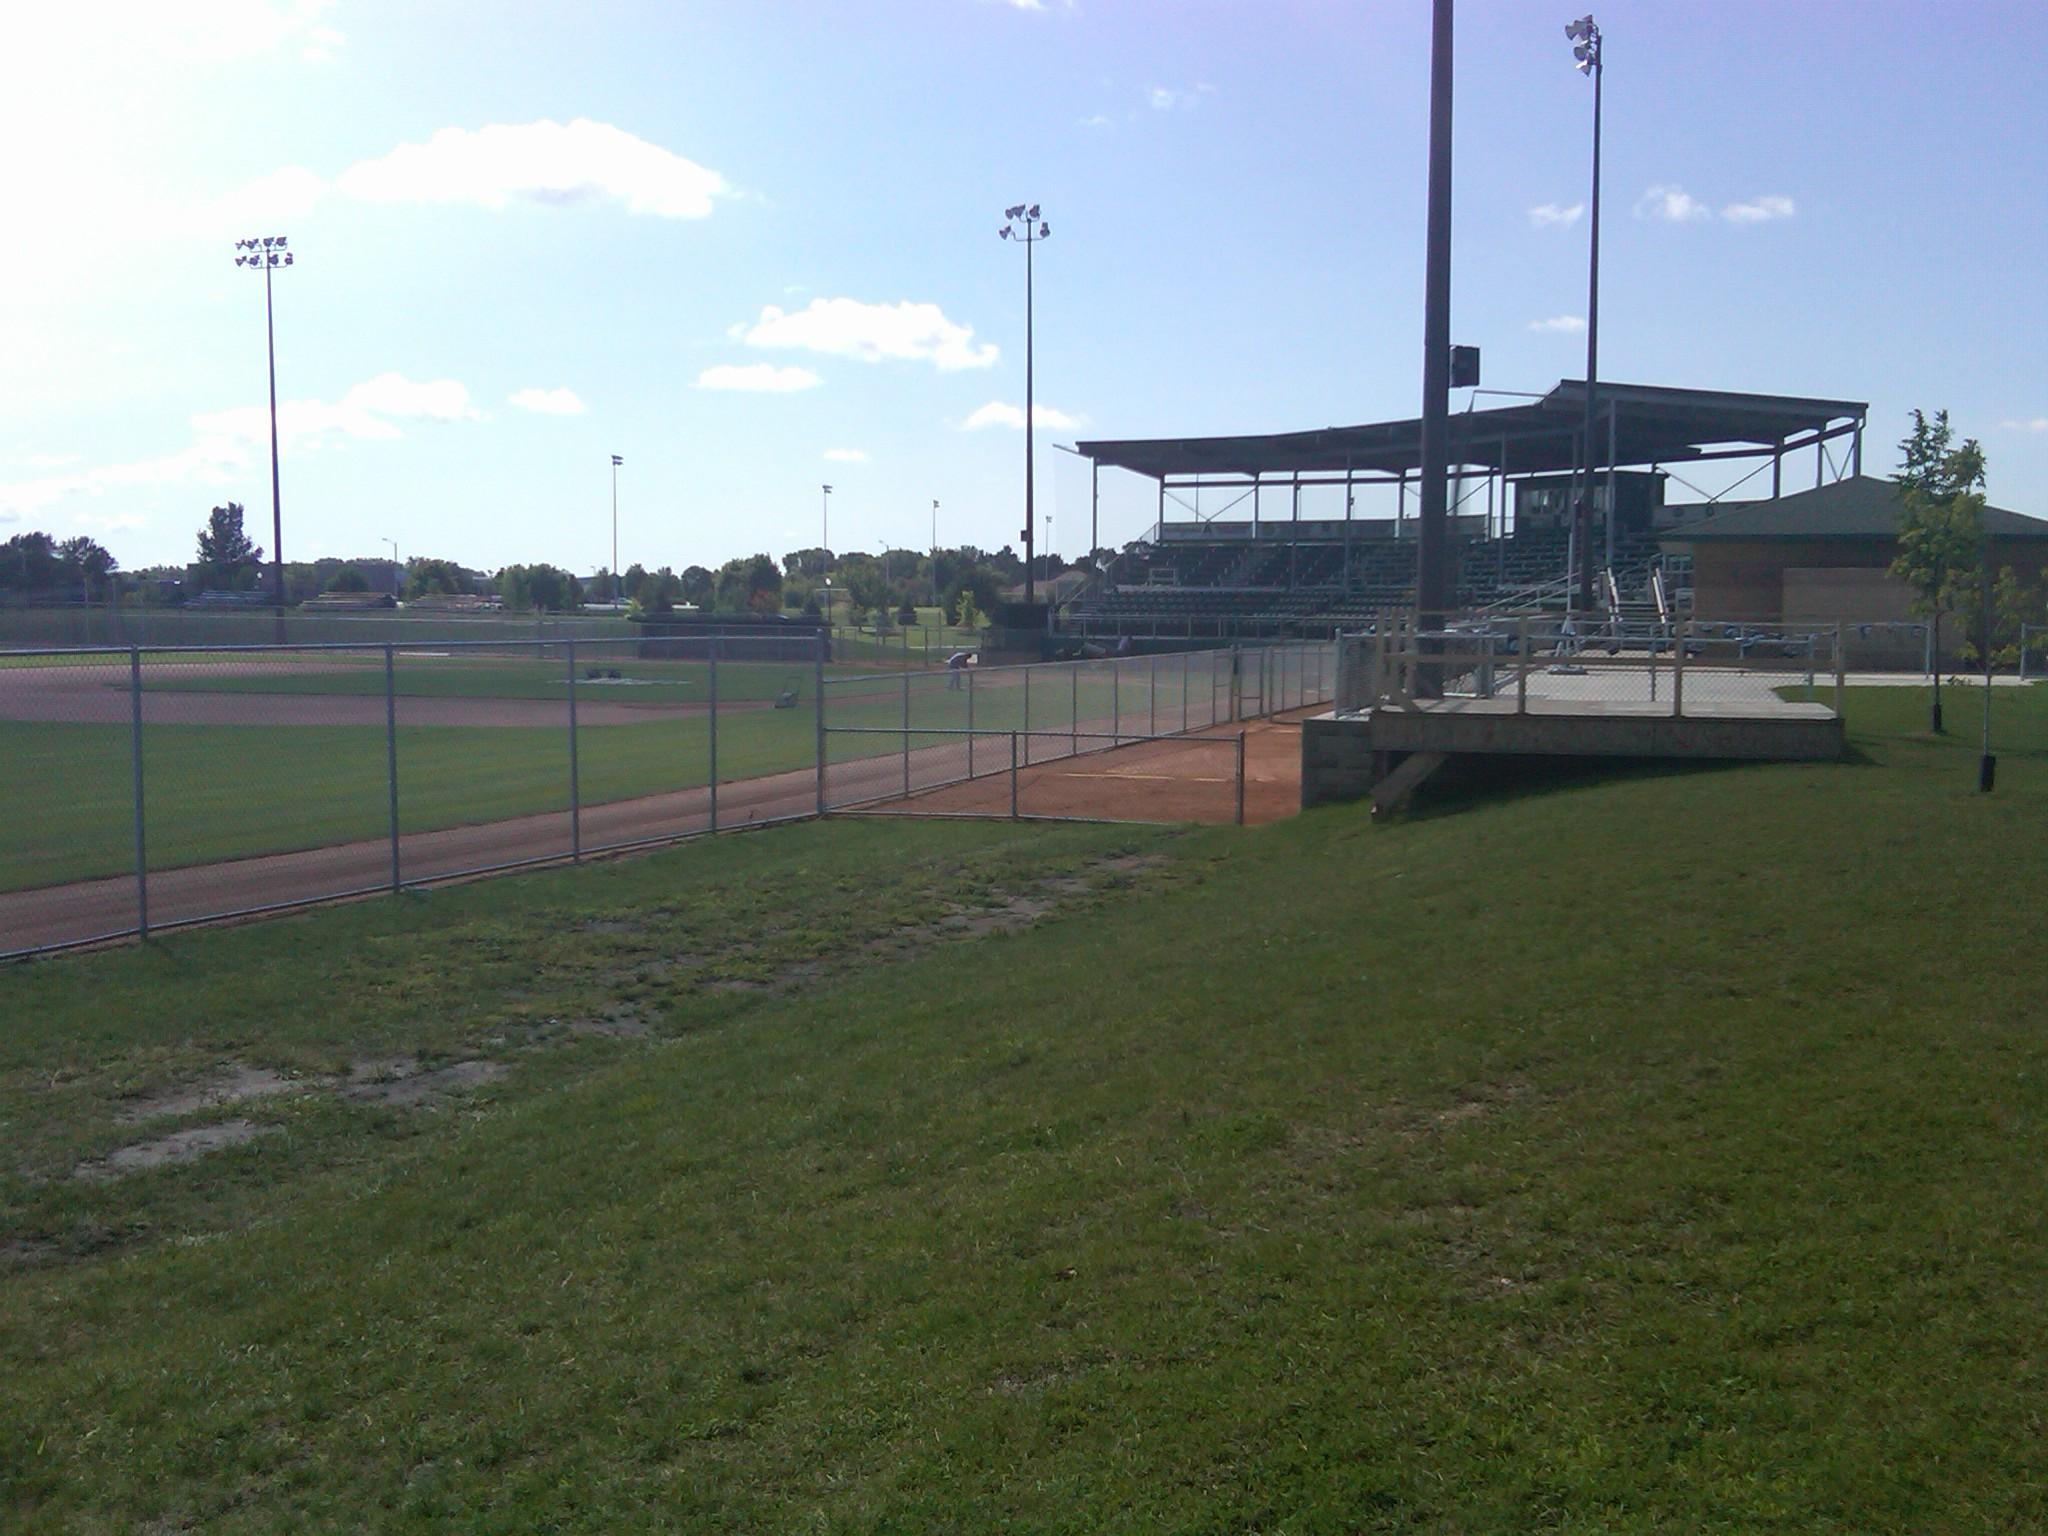 Bill Taunton Stadium in Willmar, MN